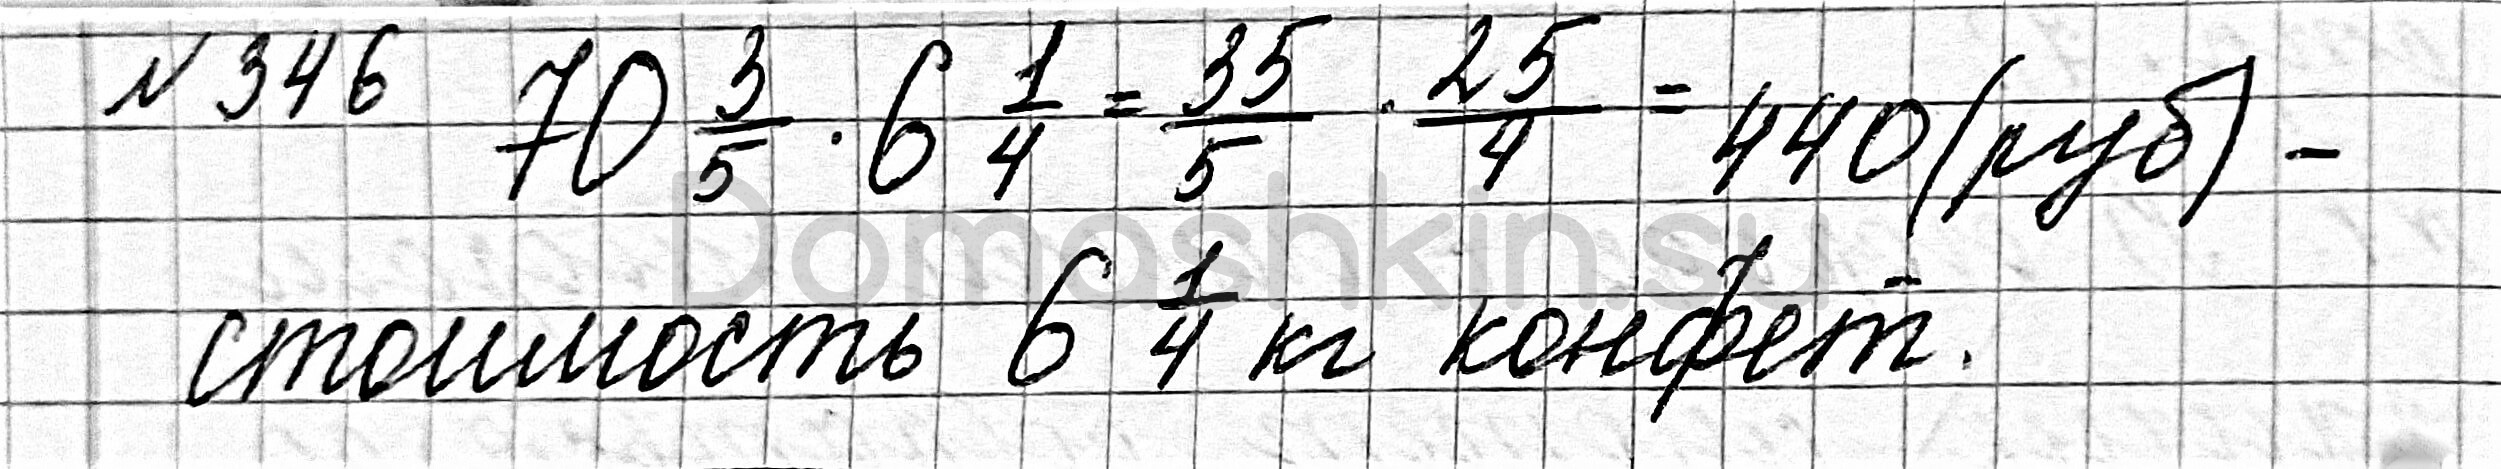 Математика 6 класс учебник Мерзляк номер 346 решение